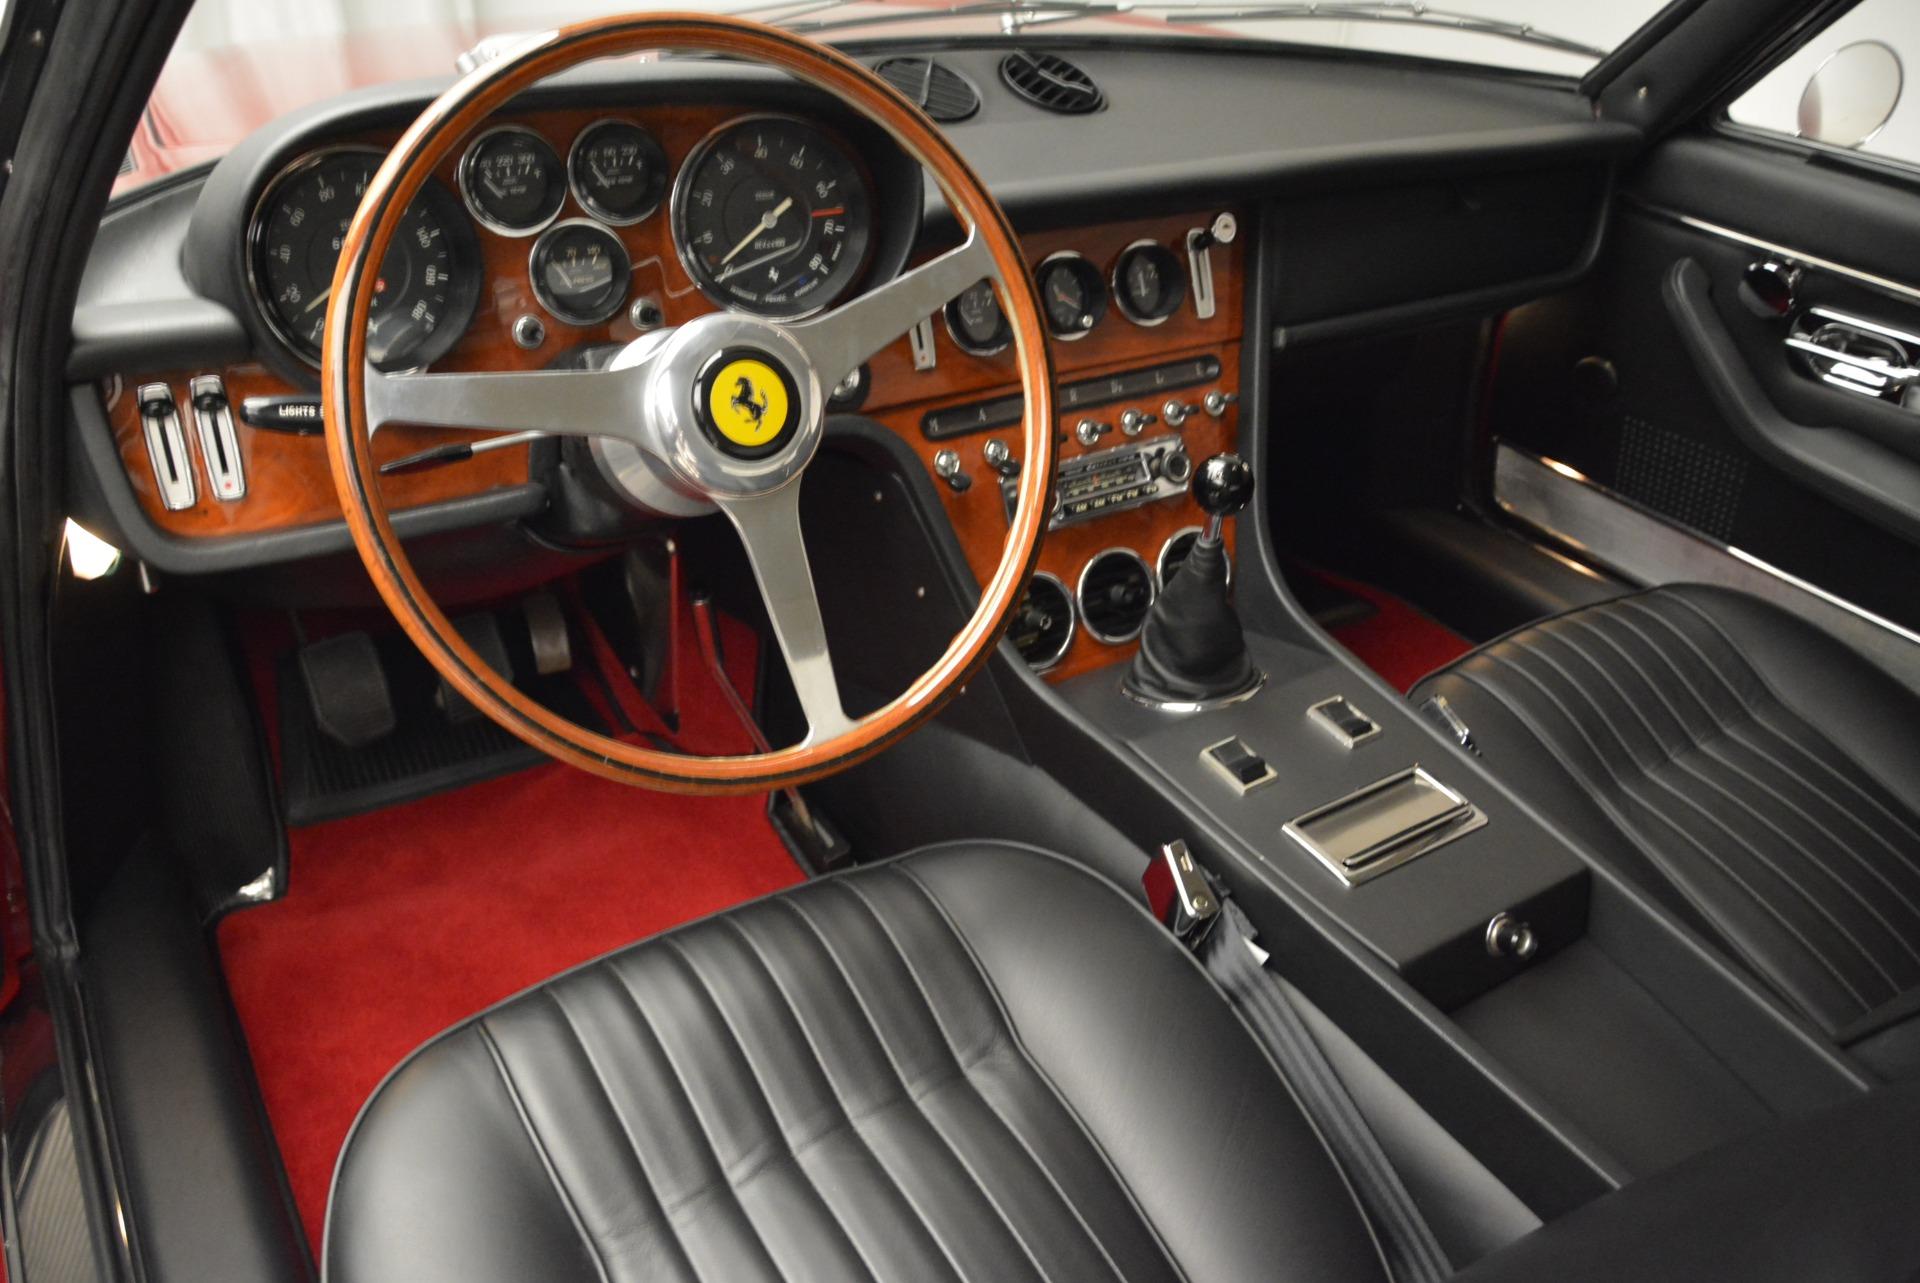 Used 1969 Ferrari 365 GT 2+2  For Sale In Greenwich, CT. Alfa Romeo of Greenwich, 4424 1995_p13